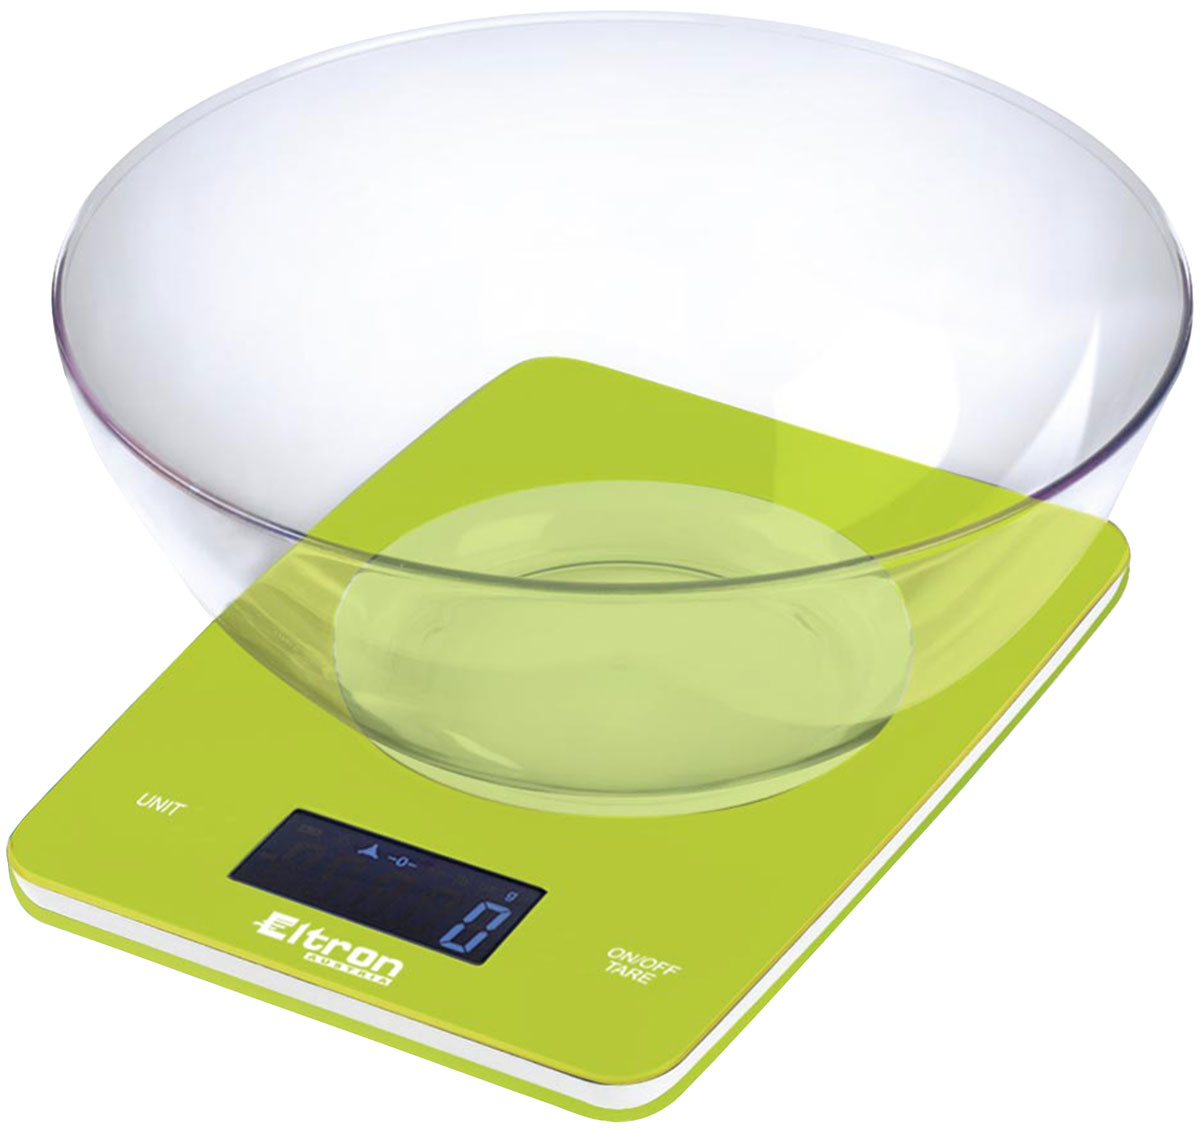 Весы кухонные  Eltron , электронные, цвет: зеленый, до 5 кг. 9263EL - Кухонные весы